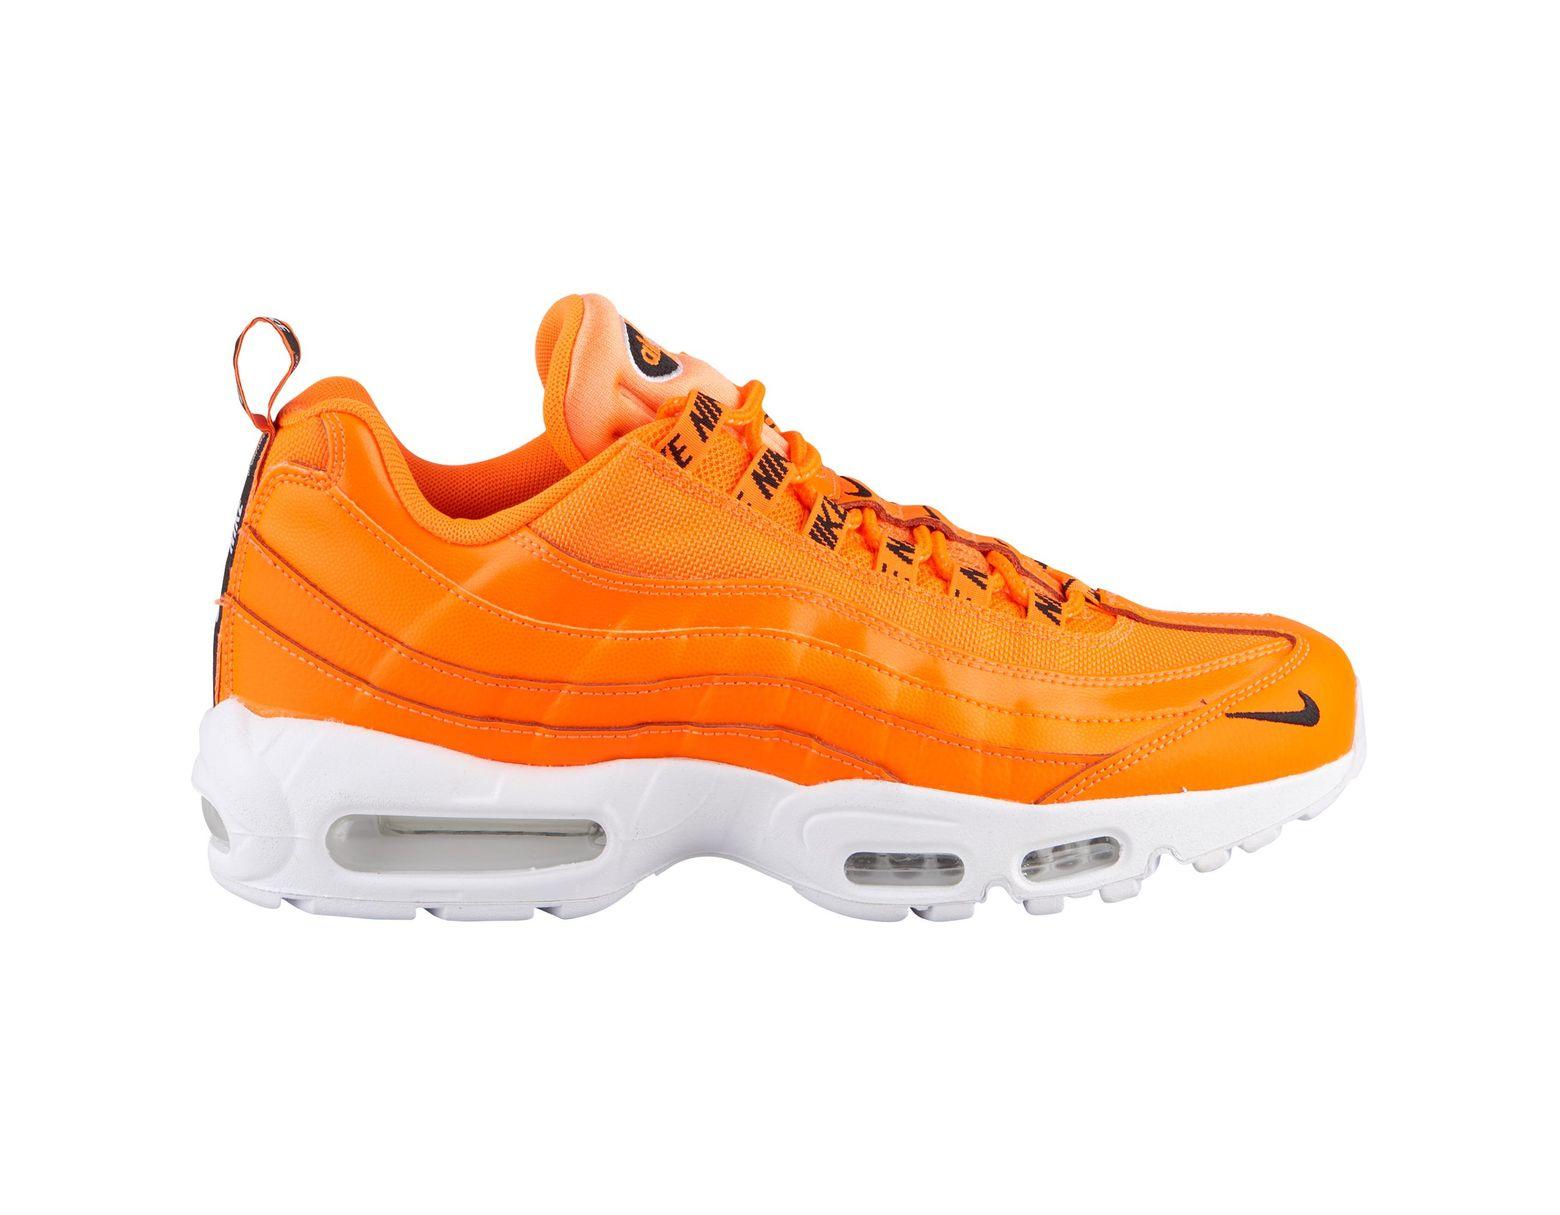 huge discount 02742 a2c4f Men's Orange Air Max 95 Running Shoes